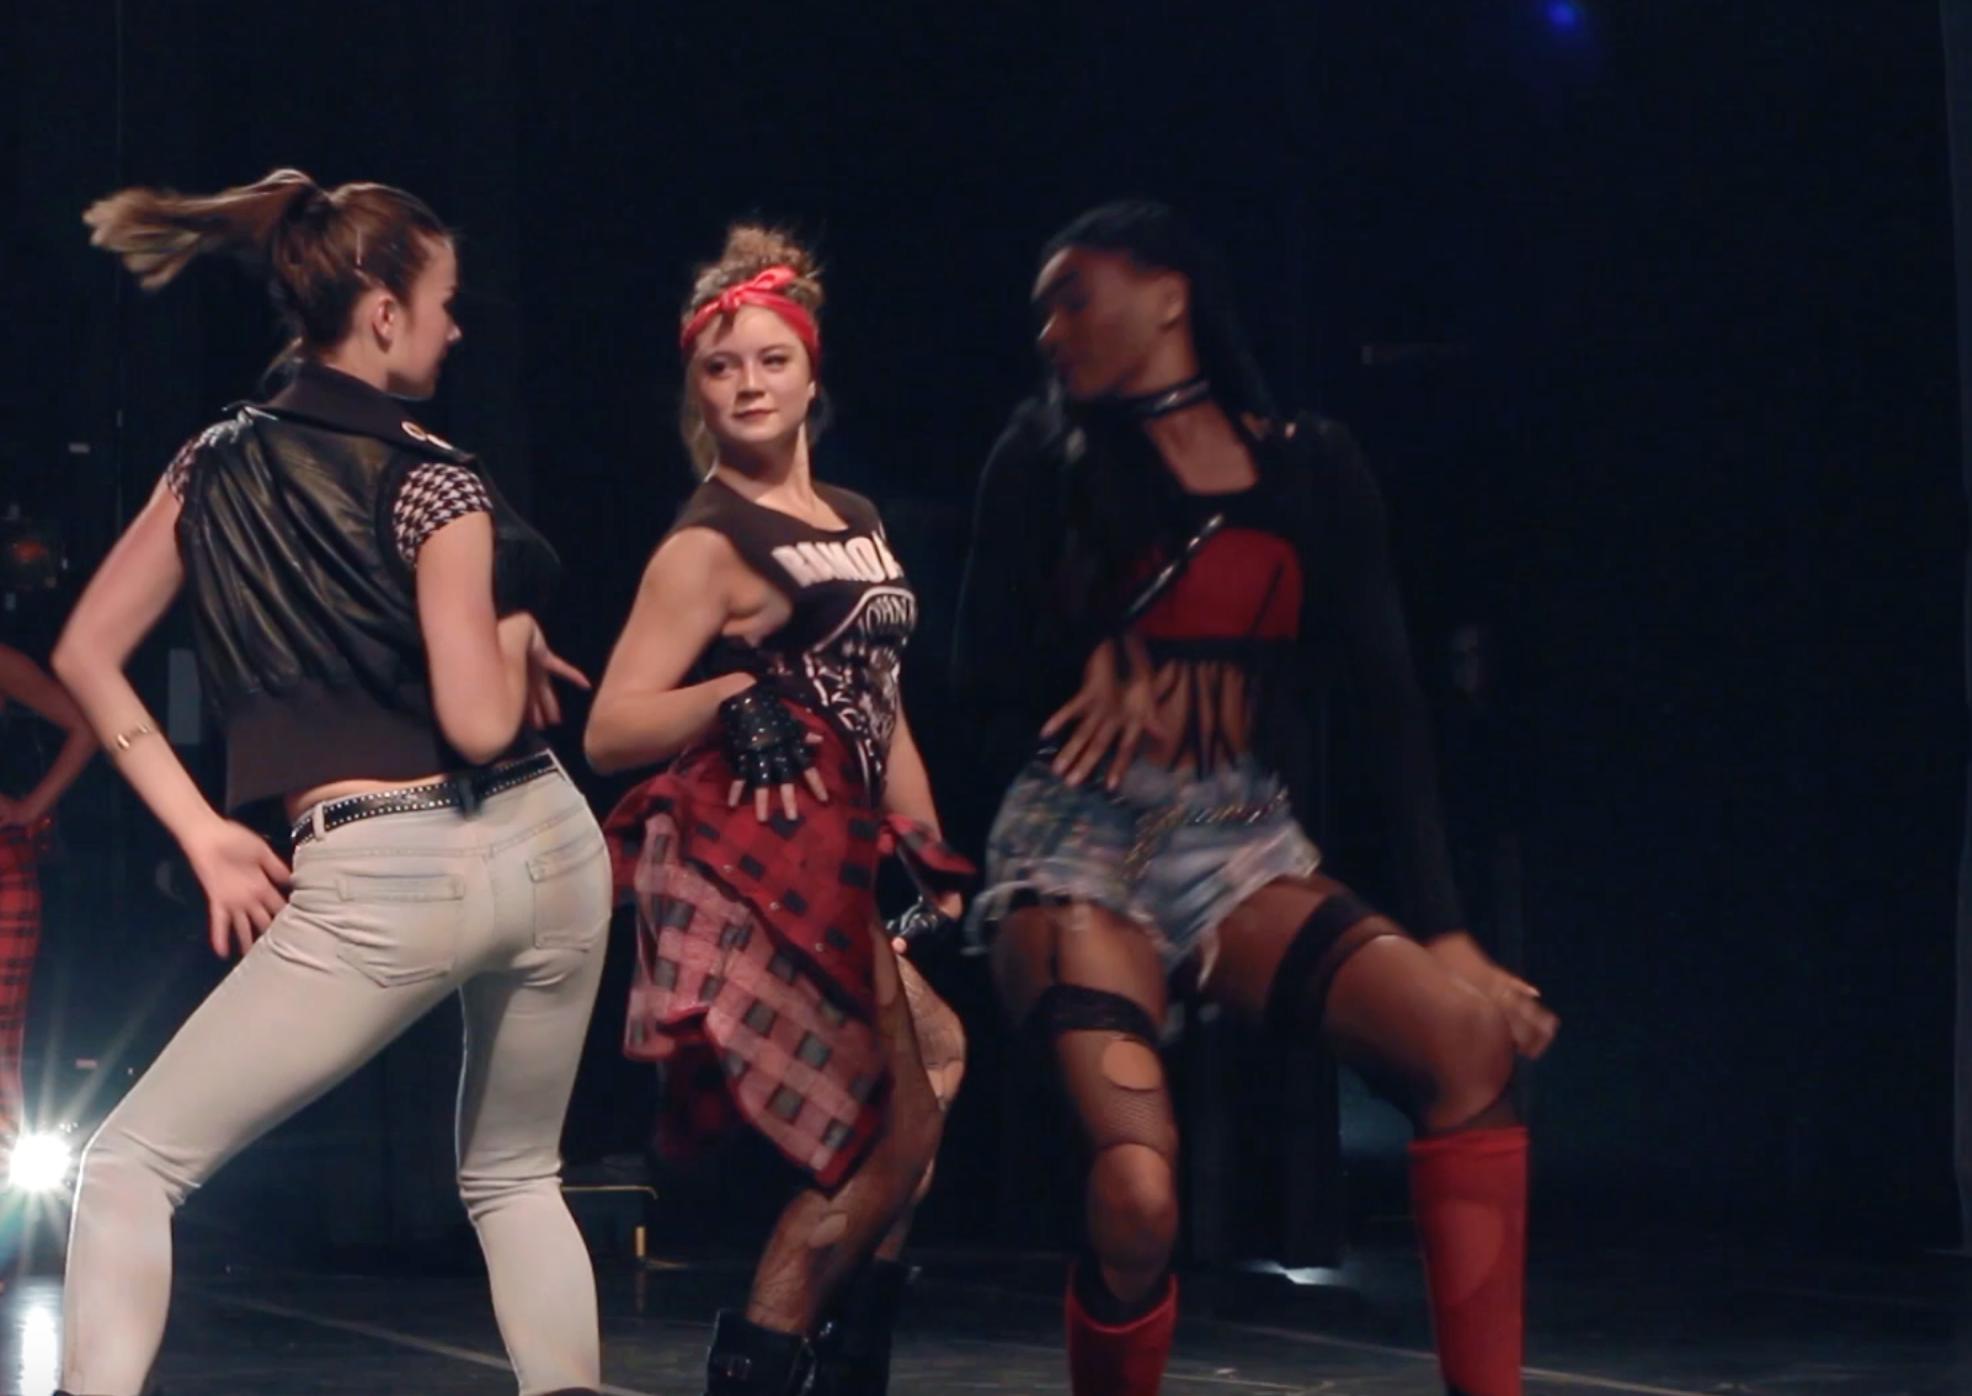 Lust for Life  | SPRING Dance Concert   (2015) Choreography: Shannon Elliott Costume Design: Matthew Smith Santa Fe University of Art & Design | Santa Fe, NM Photo credit: Kyle McAnally